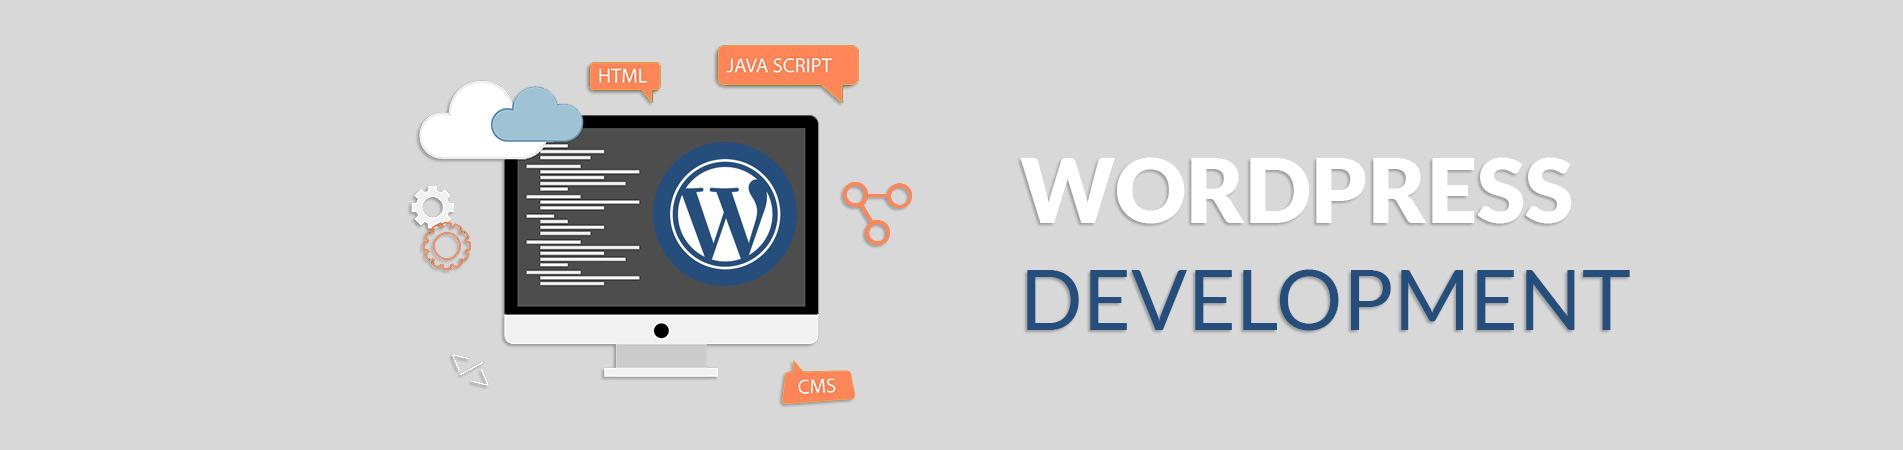 wordpress website development, website development company Bangalore